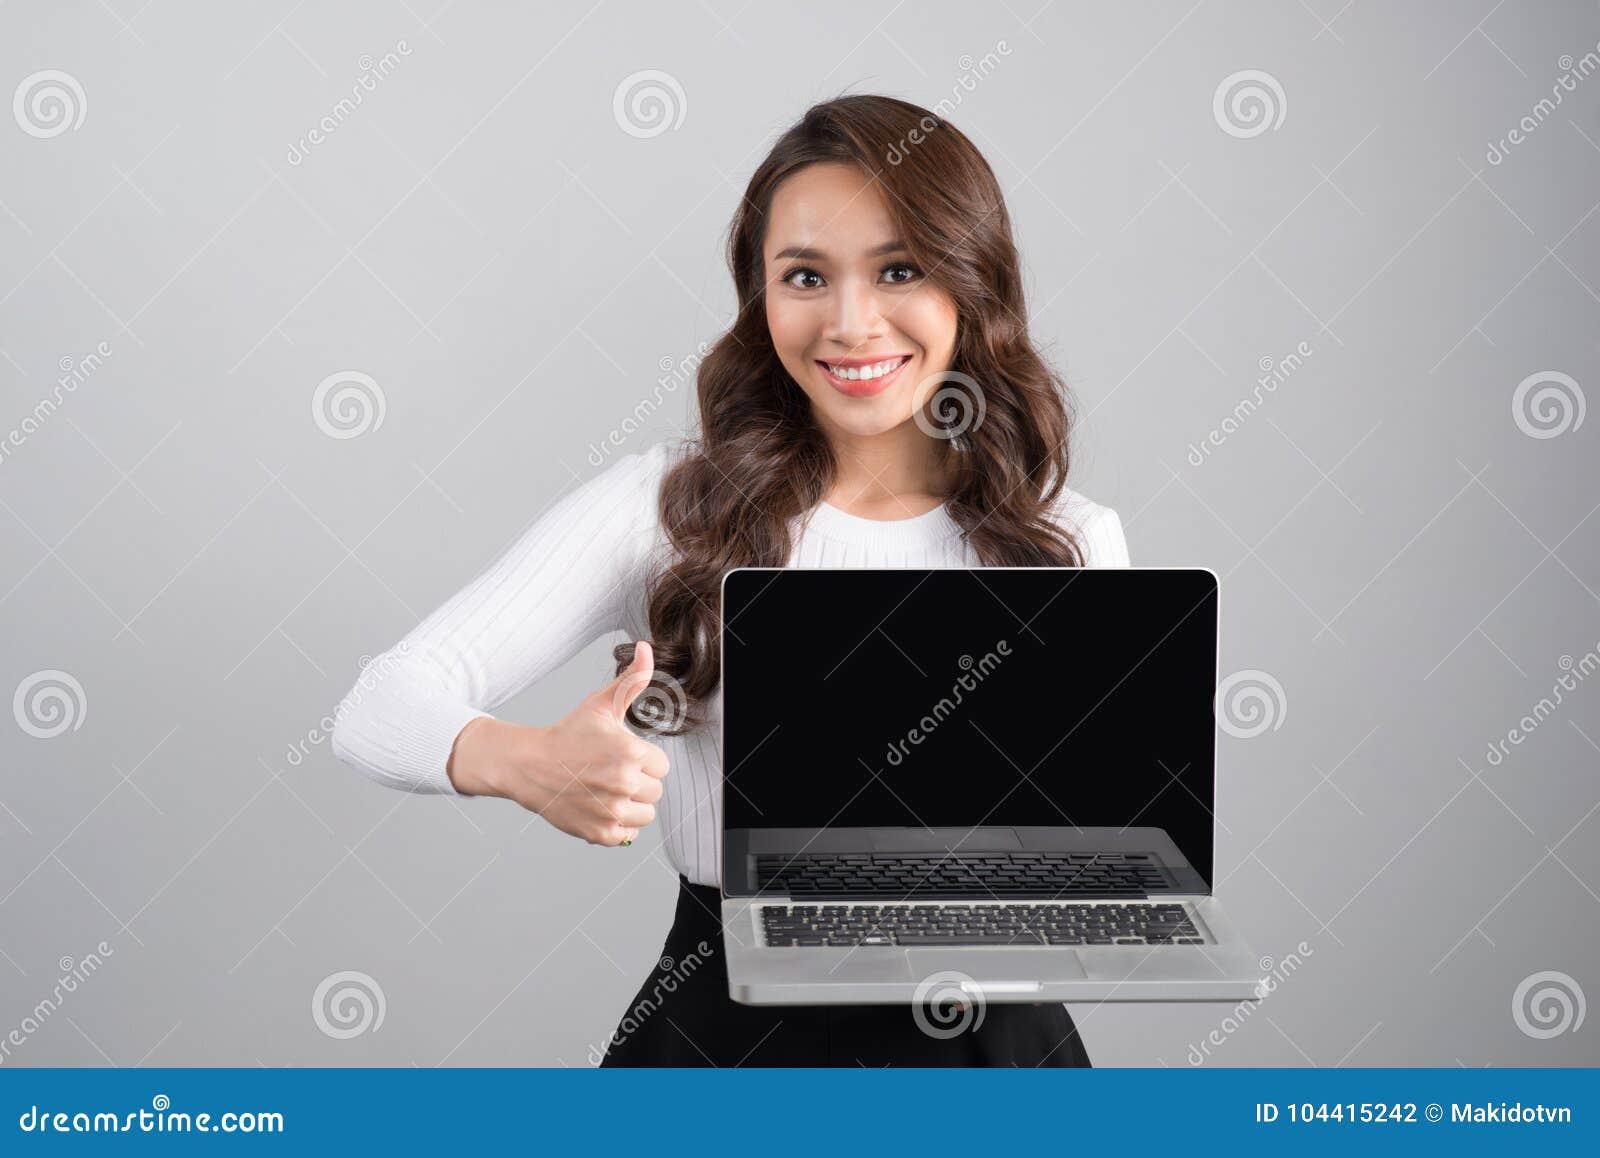 Confident asian business woman showing laptop screen.